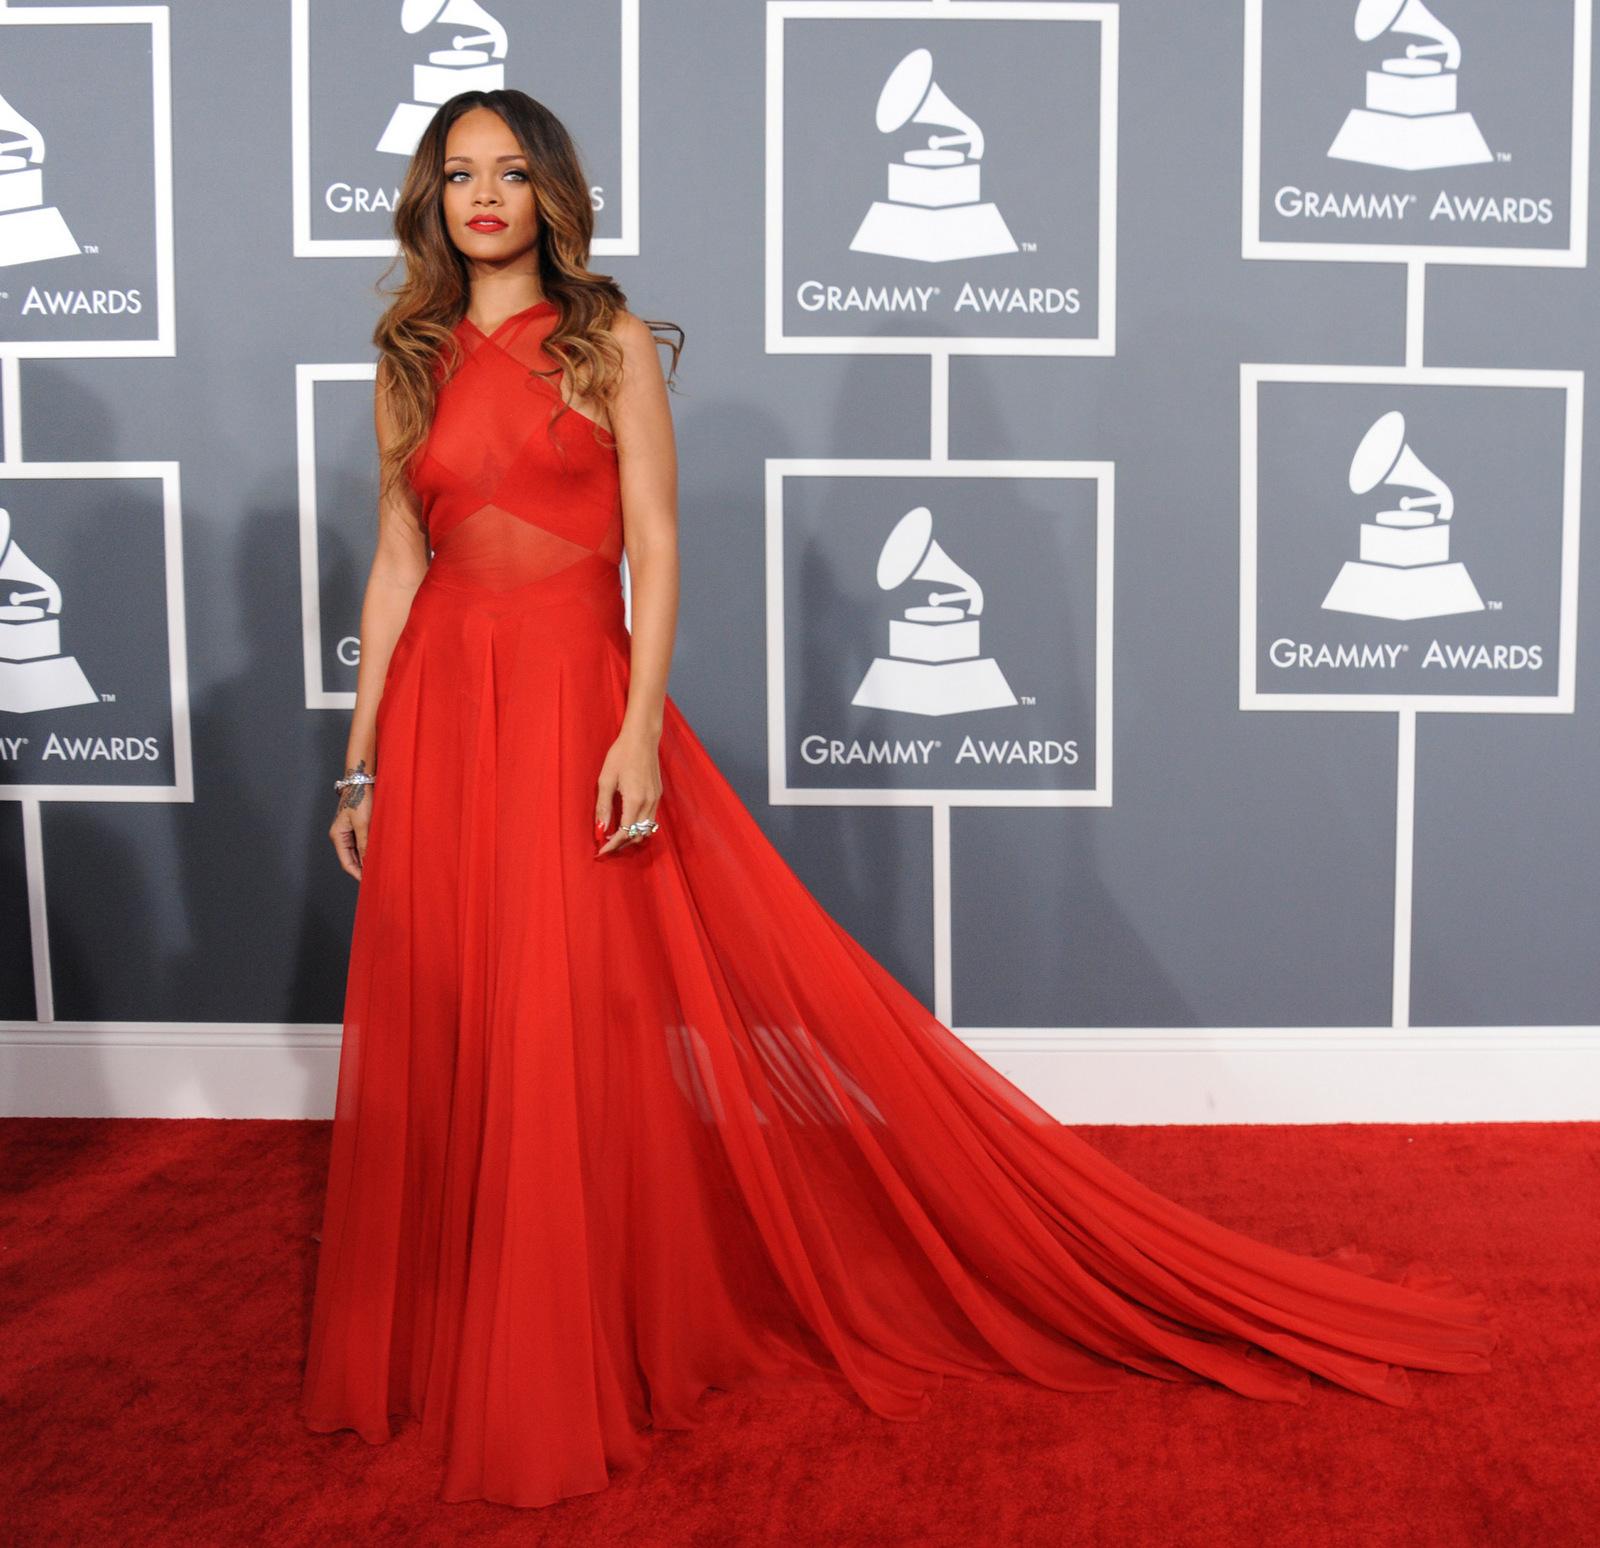 Rihanna fashion Grammy Awards red gown